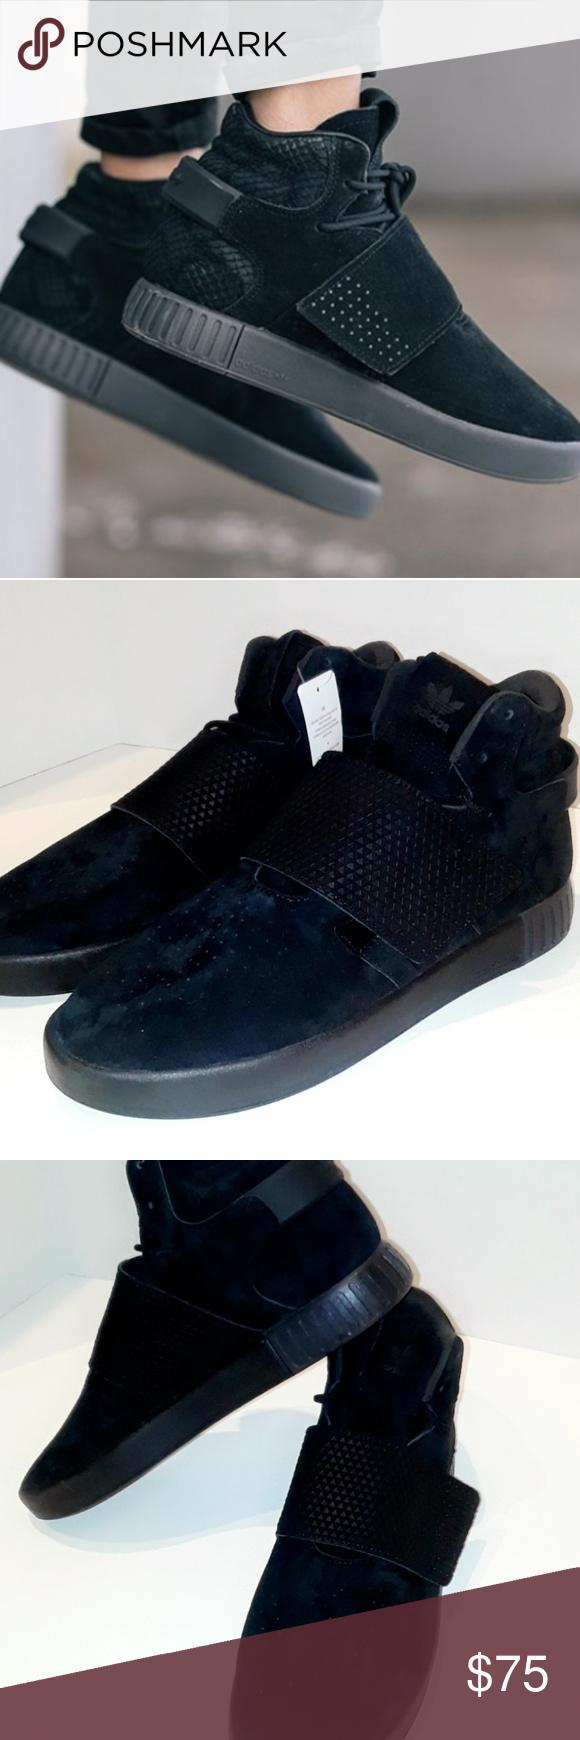 Adidas zapatilla NWT Pluma invasor tubular correa Negro Pluma NWT de plata f6a8a7